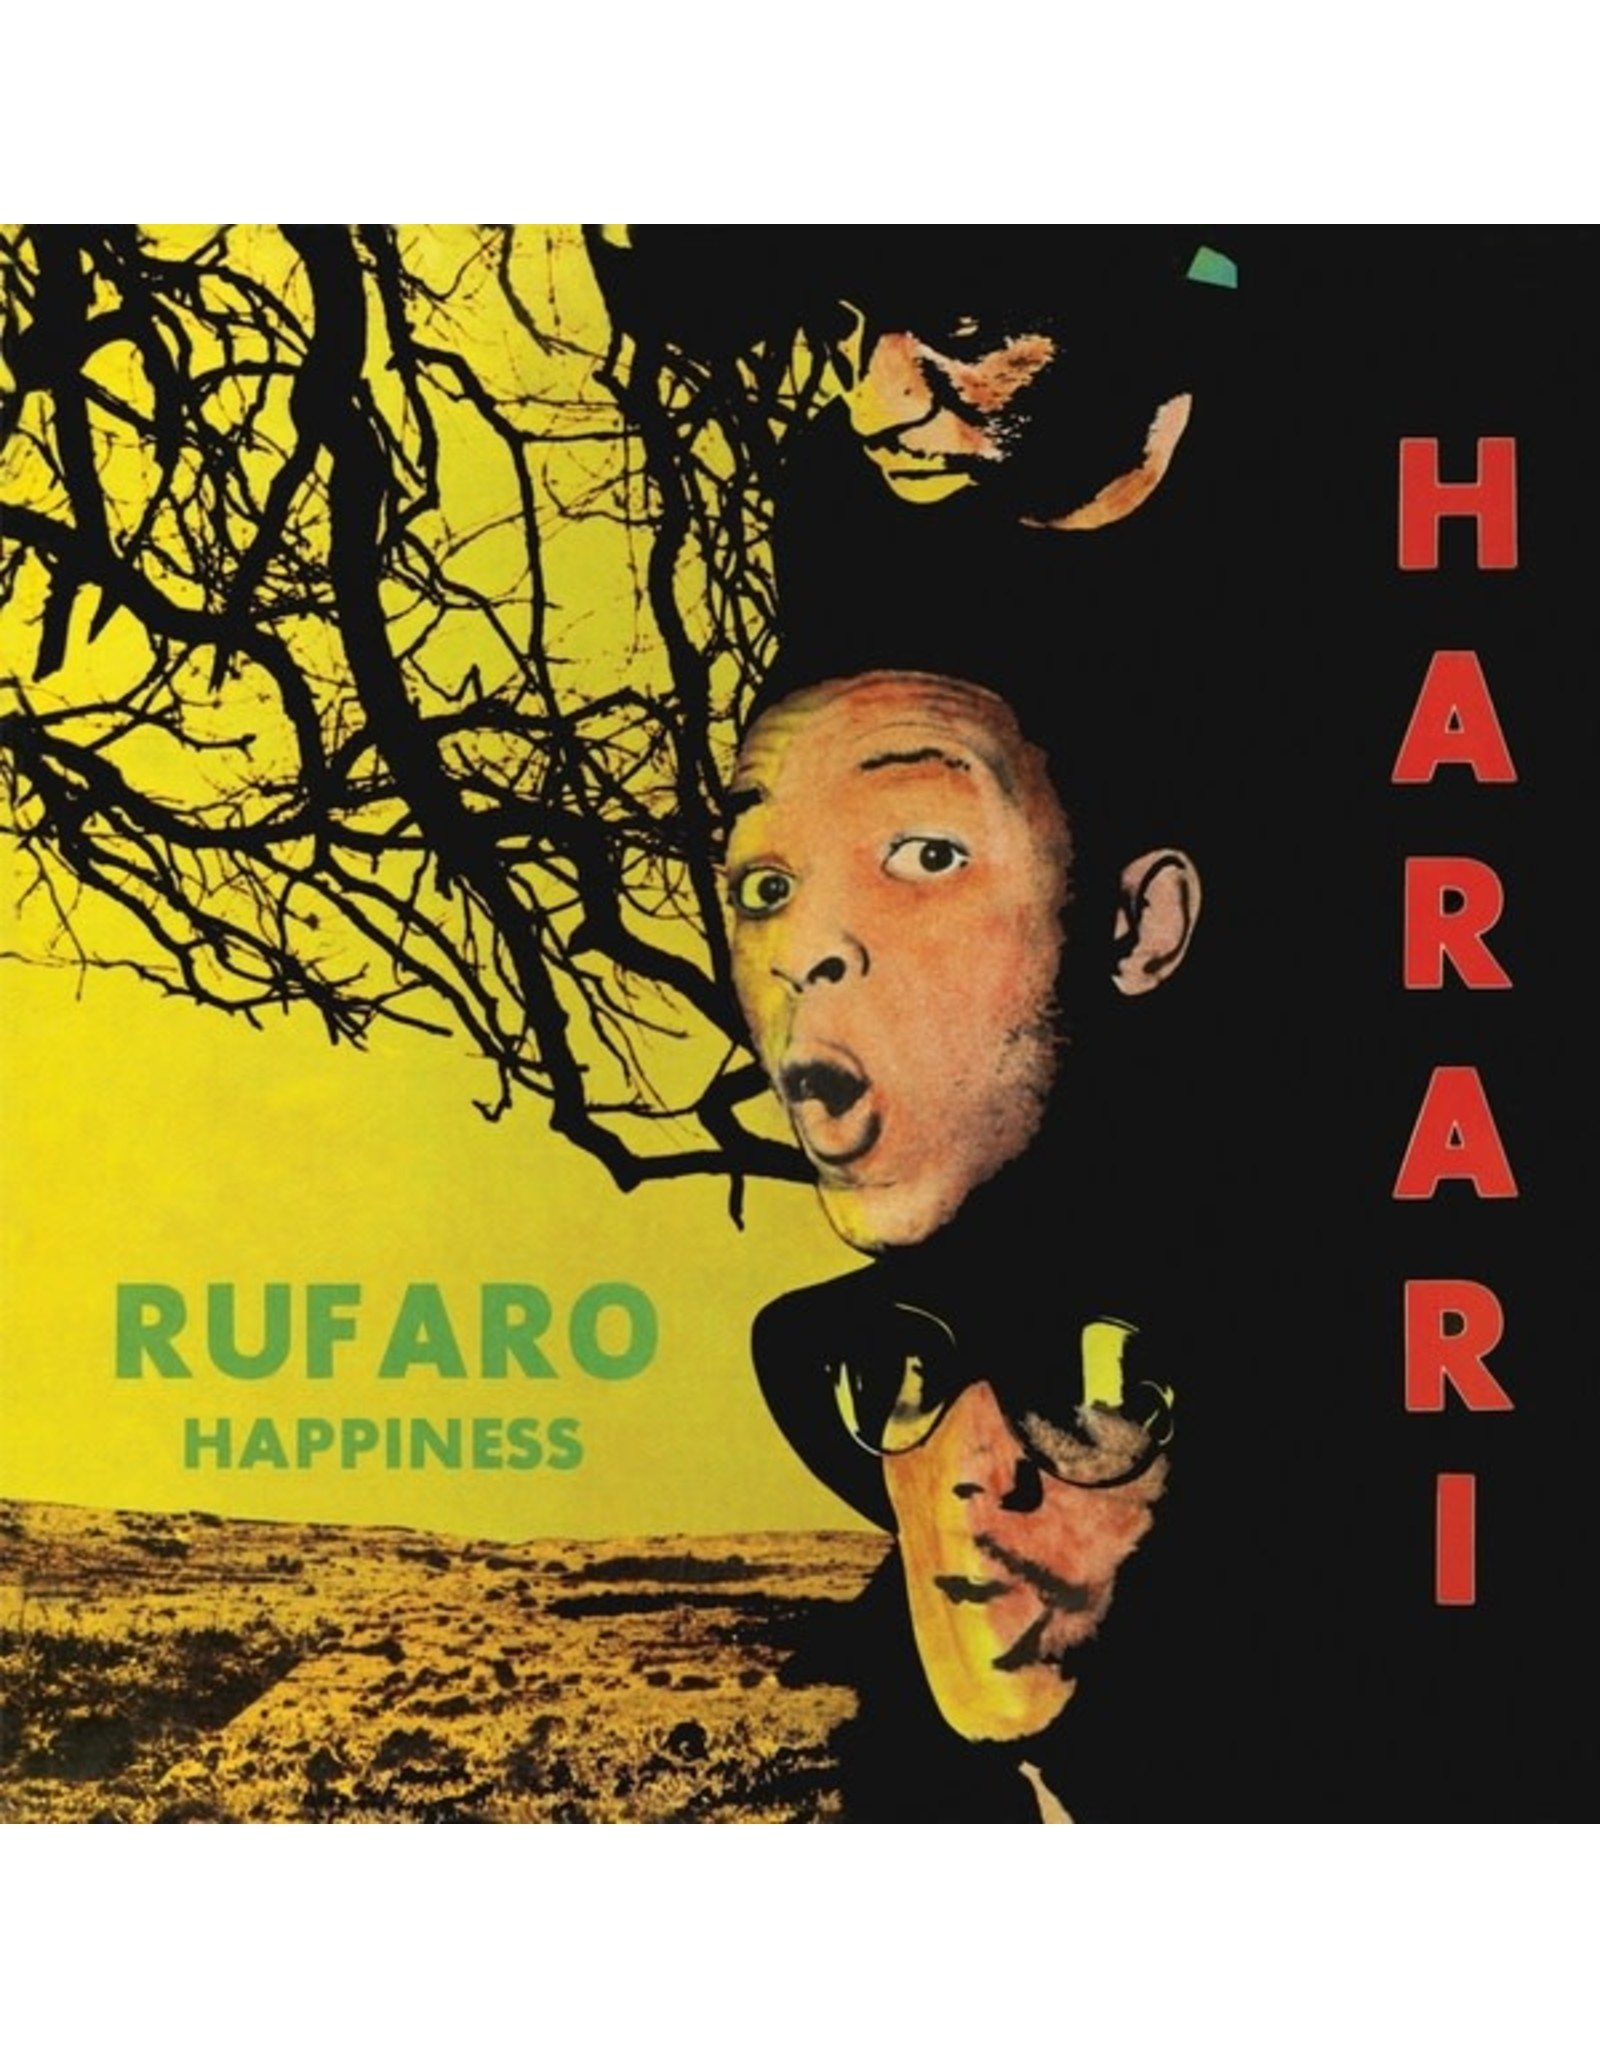 New Vinyl Harari - Rufaro / Happiness LP